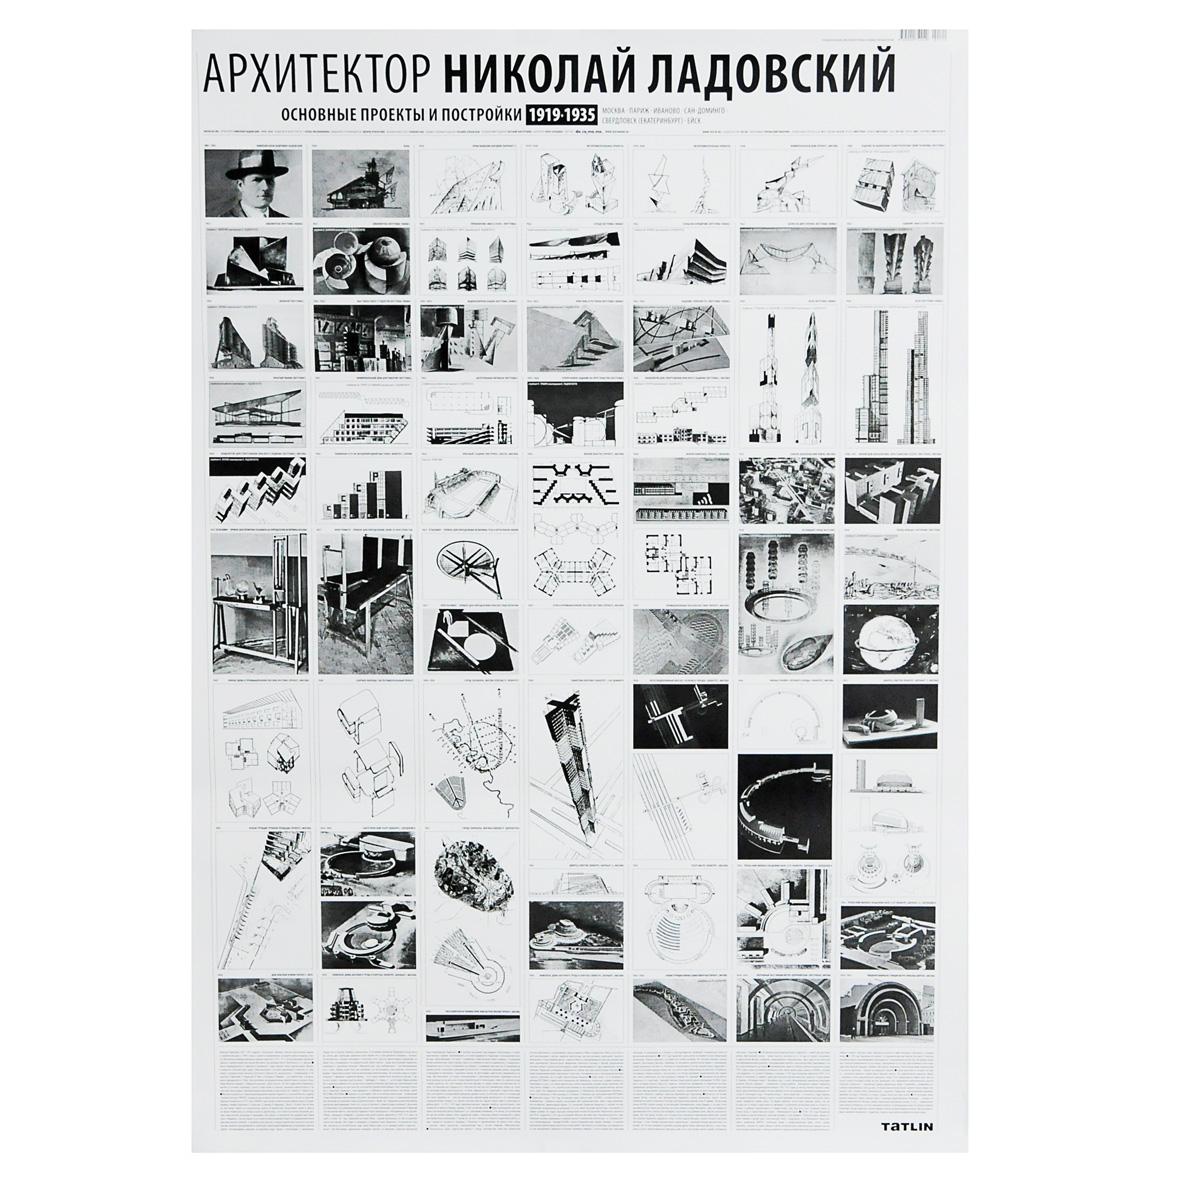 Archilog №6. Архитектор Николай Ладовский. 1919-1935. Плакат